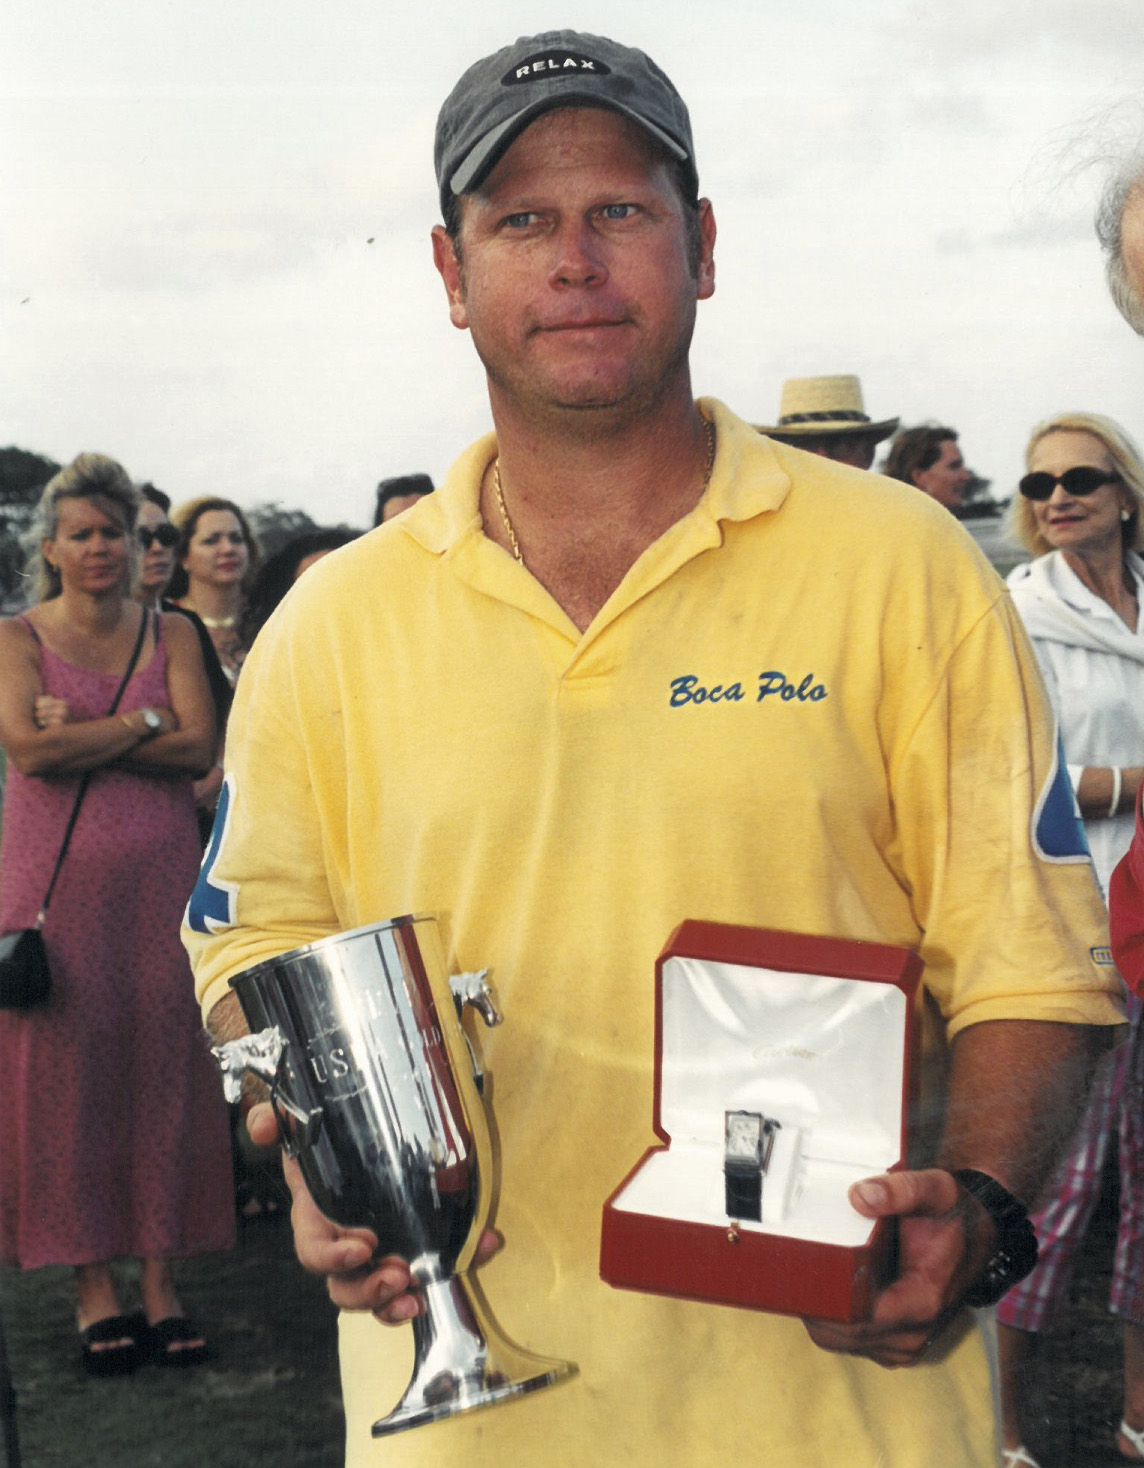 Joey receiving MVP award 2001 USPA Gold Cup